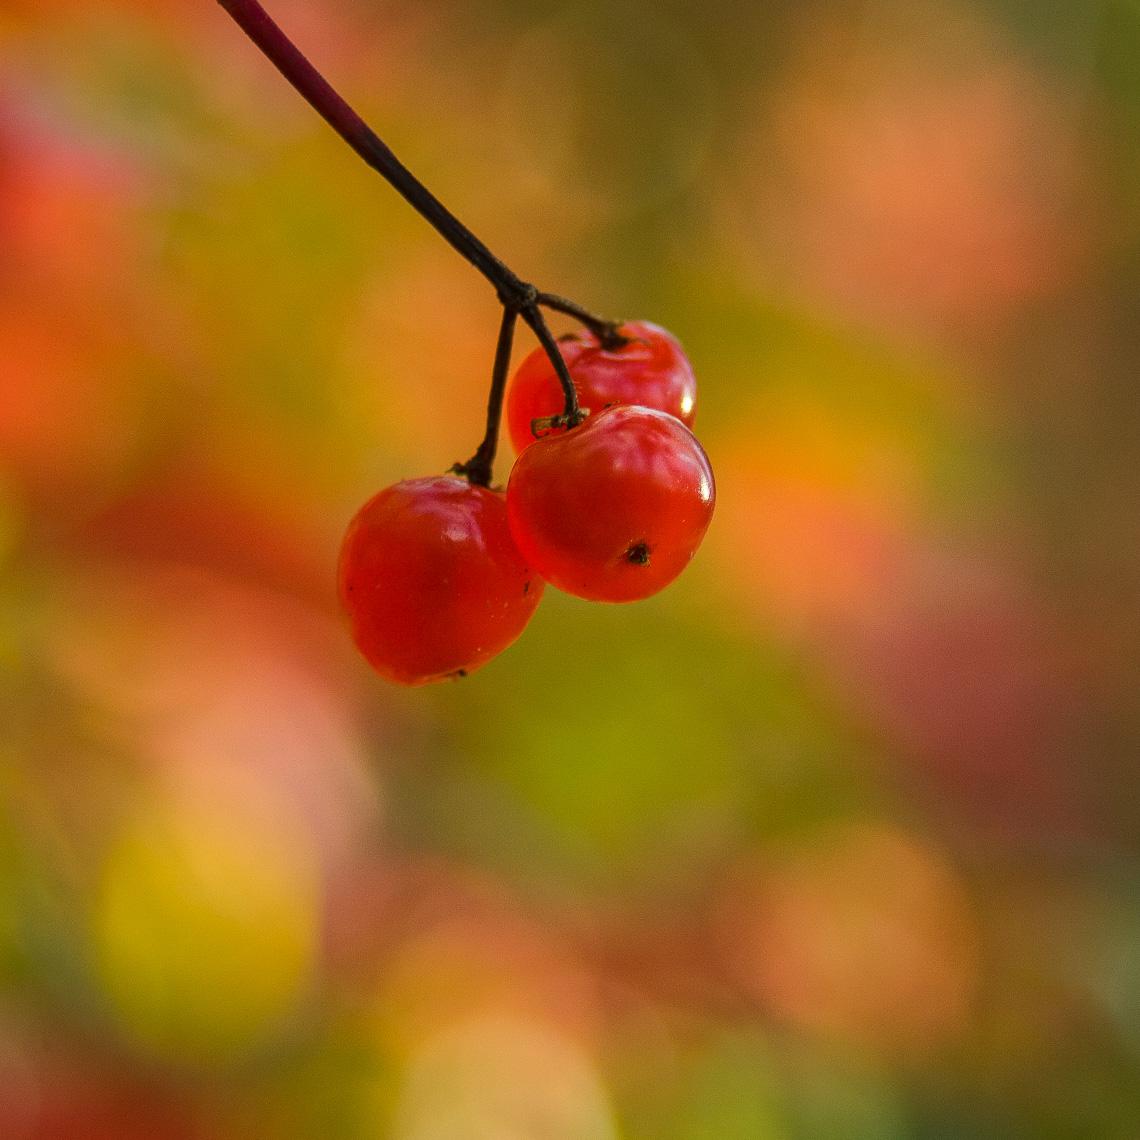 Soapberry - Tarius Design, Whitehorse, Yukon (Canada)